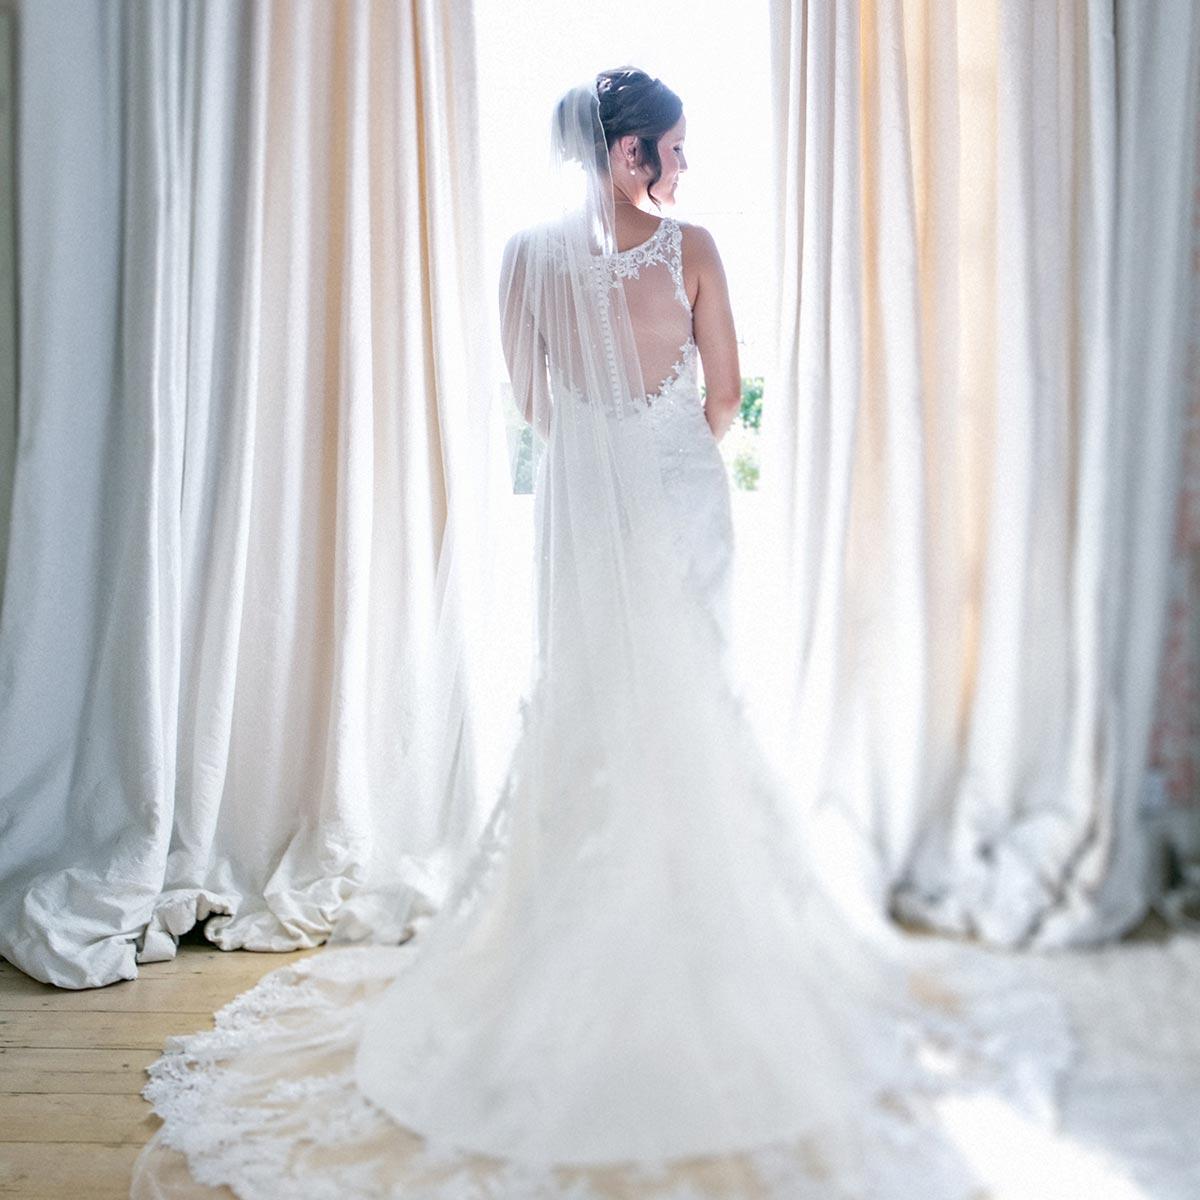 wedding-gallery15.jpg